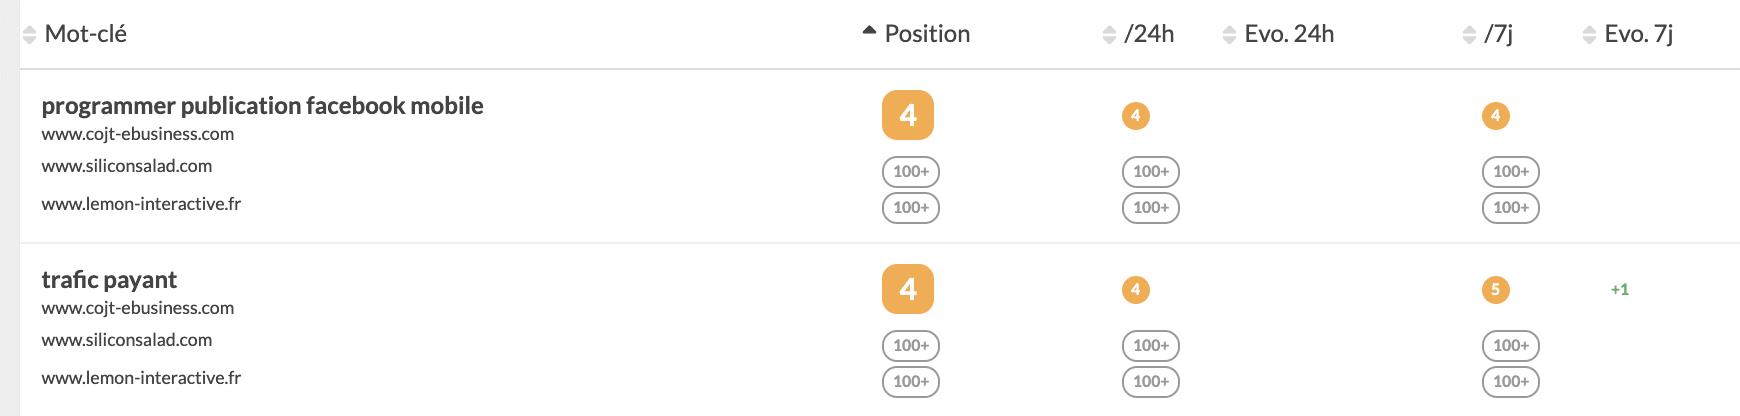 blog-COJT-analyser-votre-site-web-position